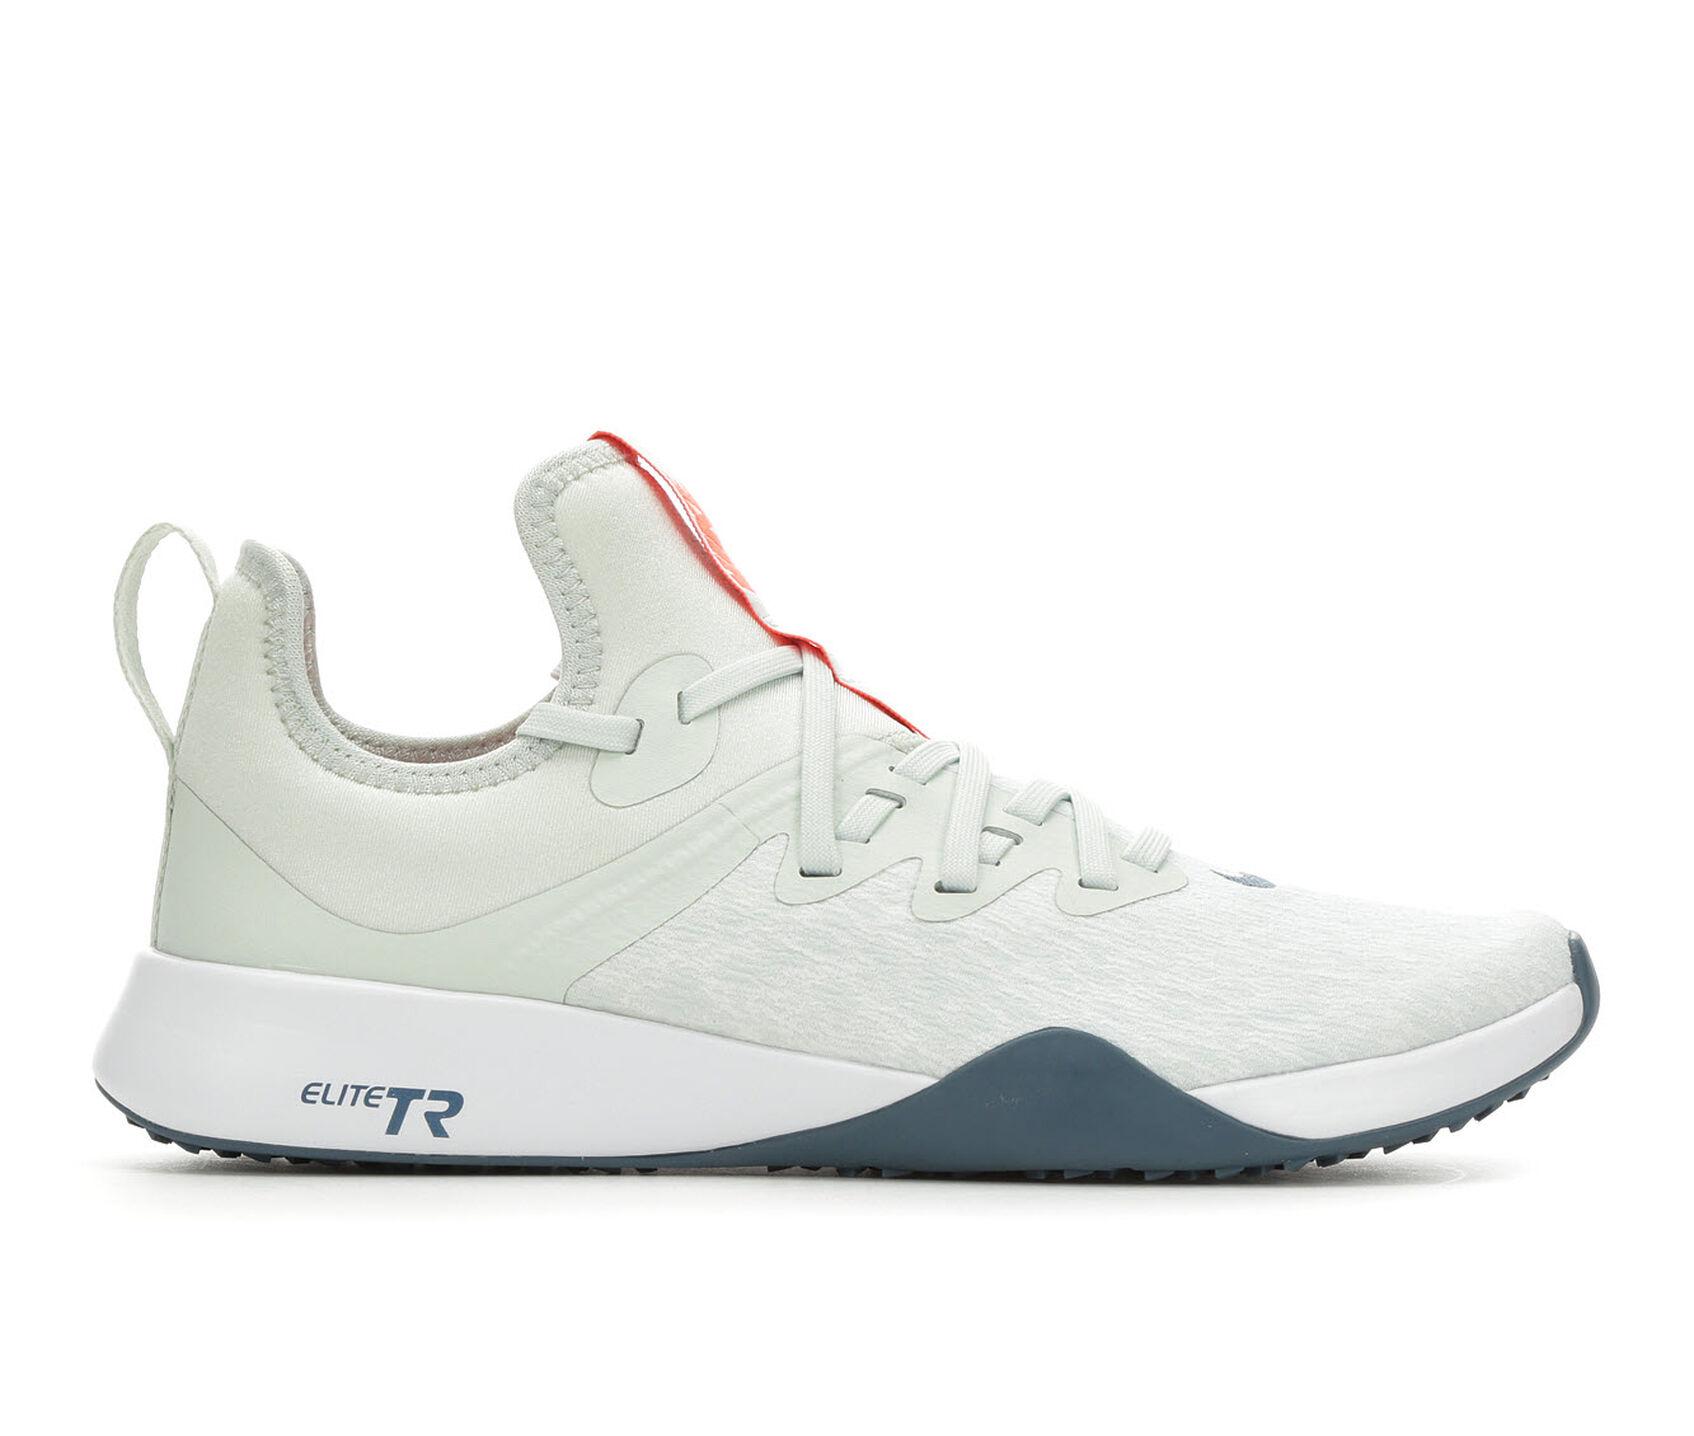 d4f951c73 Women's Nike Foundation Elite TR Training Shoes | Shoe Carnival